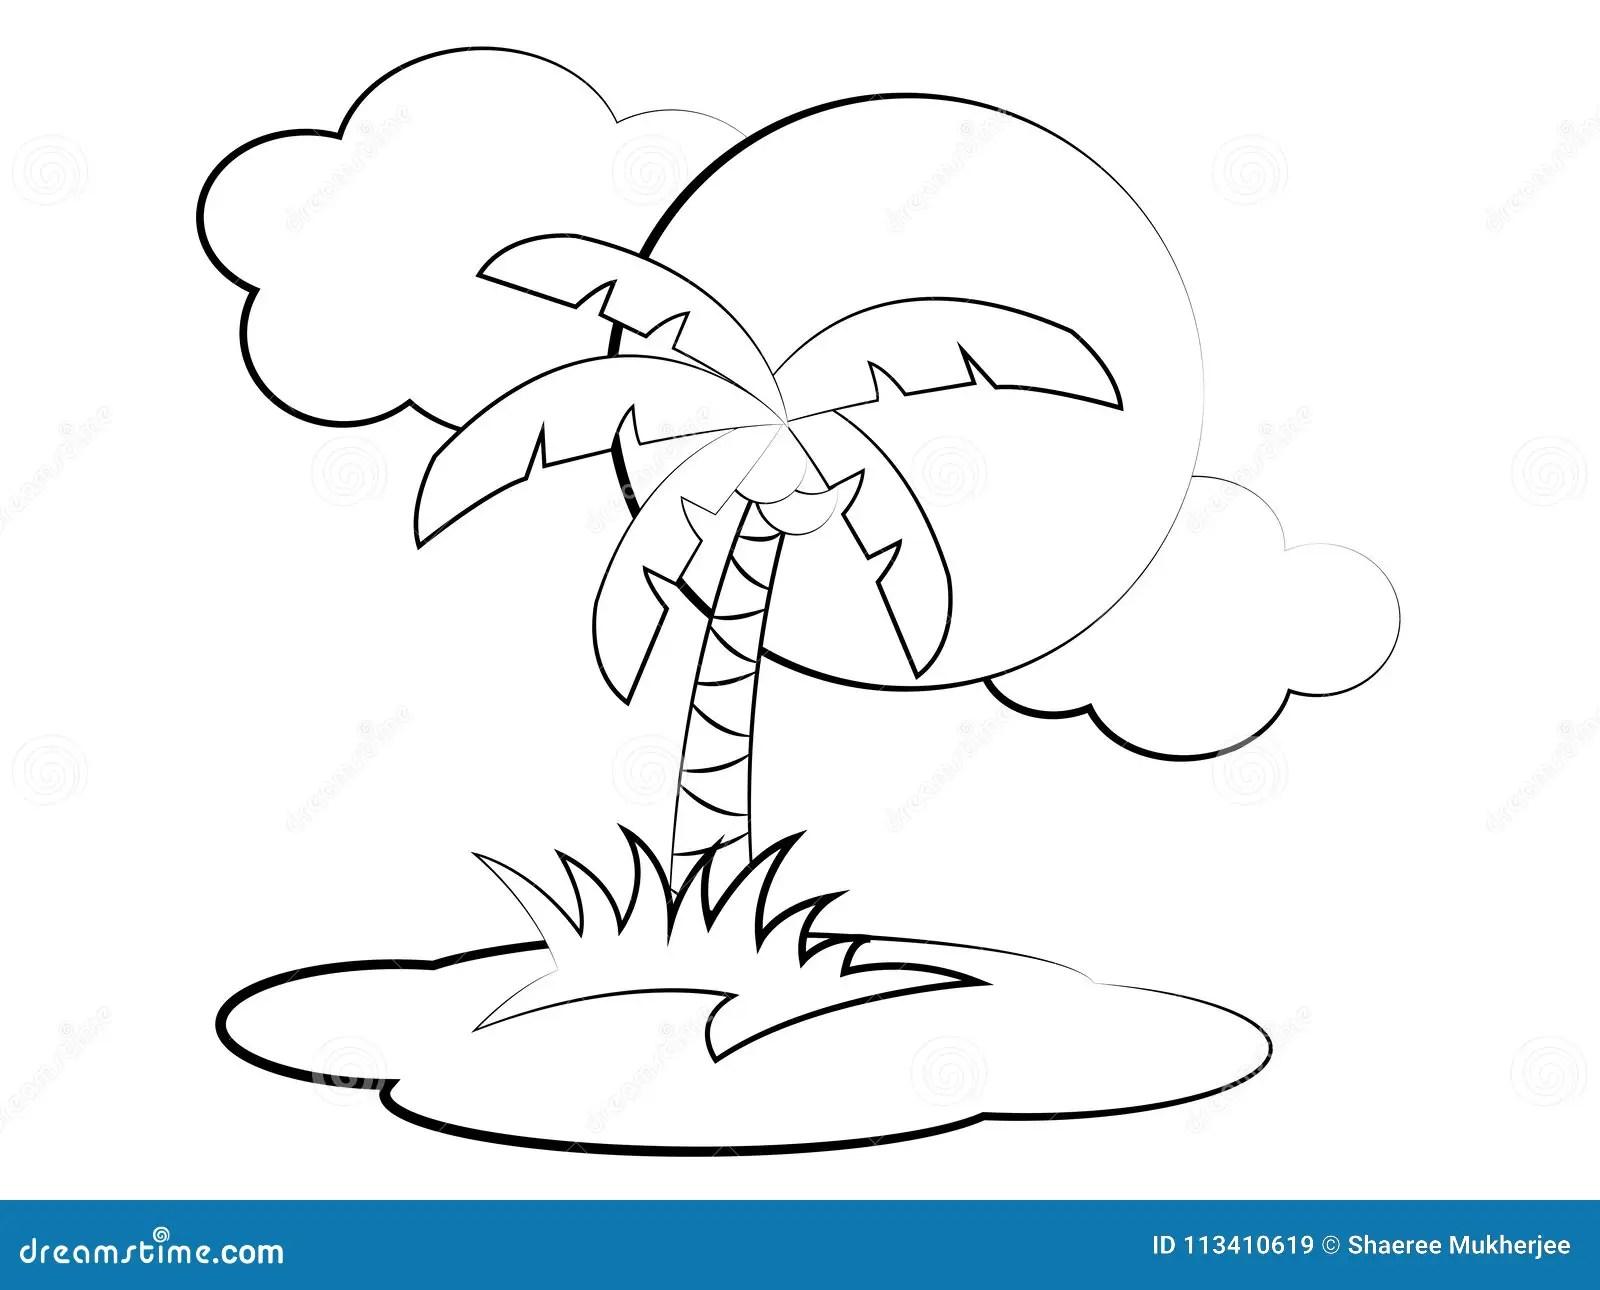 Vektor Karikatur Palme Farbton Seite Vektor Abbildung